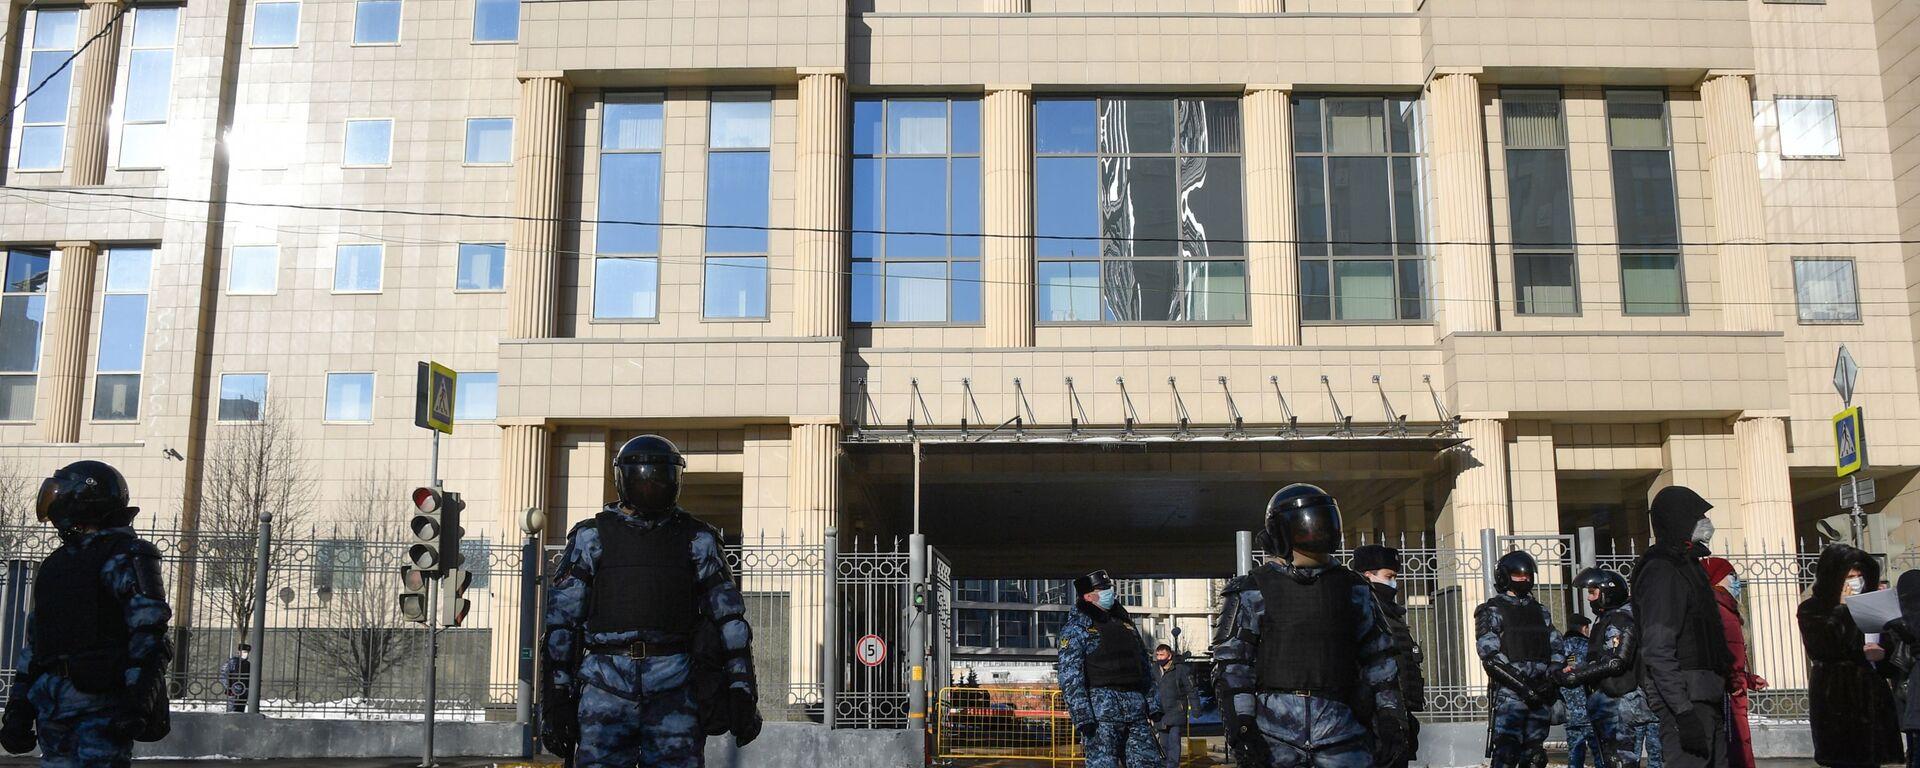 Ситуация у здания Мосгорсуда - Sputnik Армения, 1920, 21.07.2021